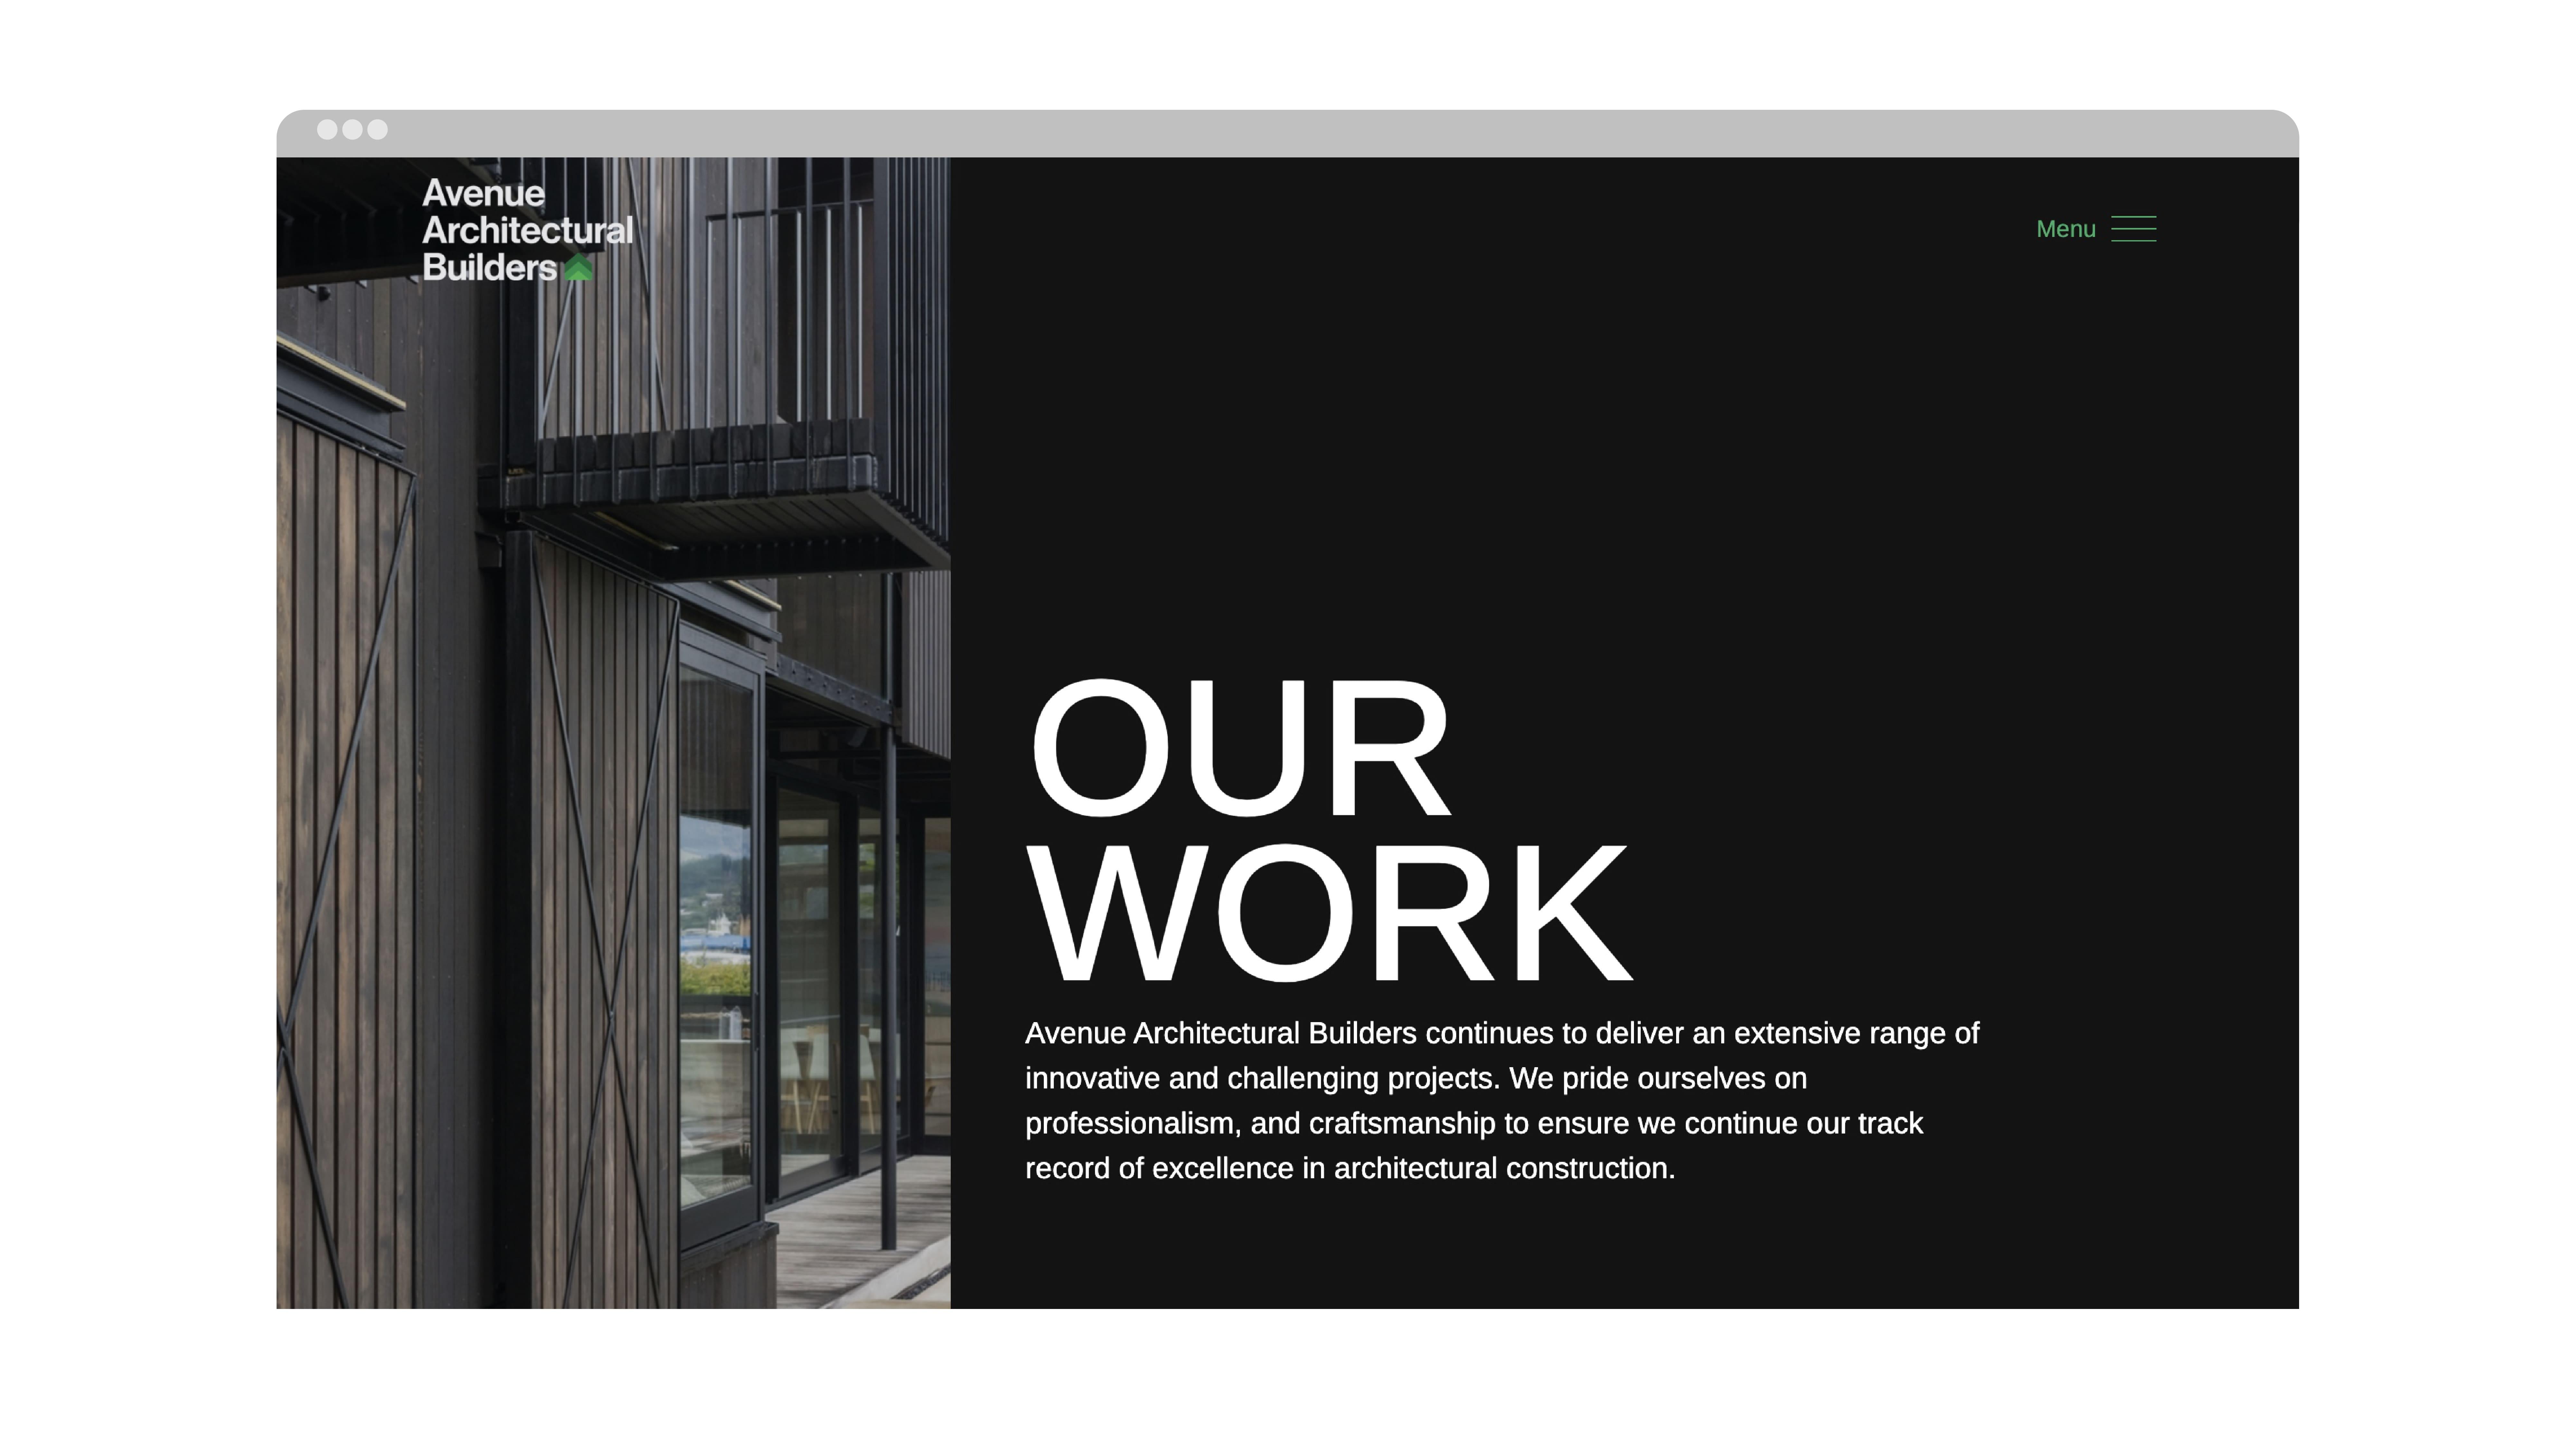 attraction studio avenue architectural brand web website projects